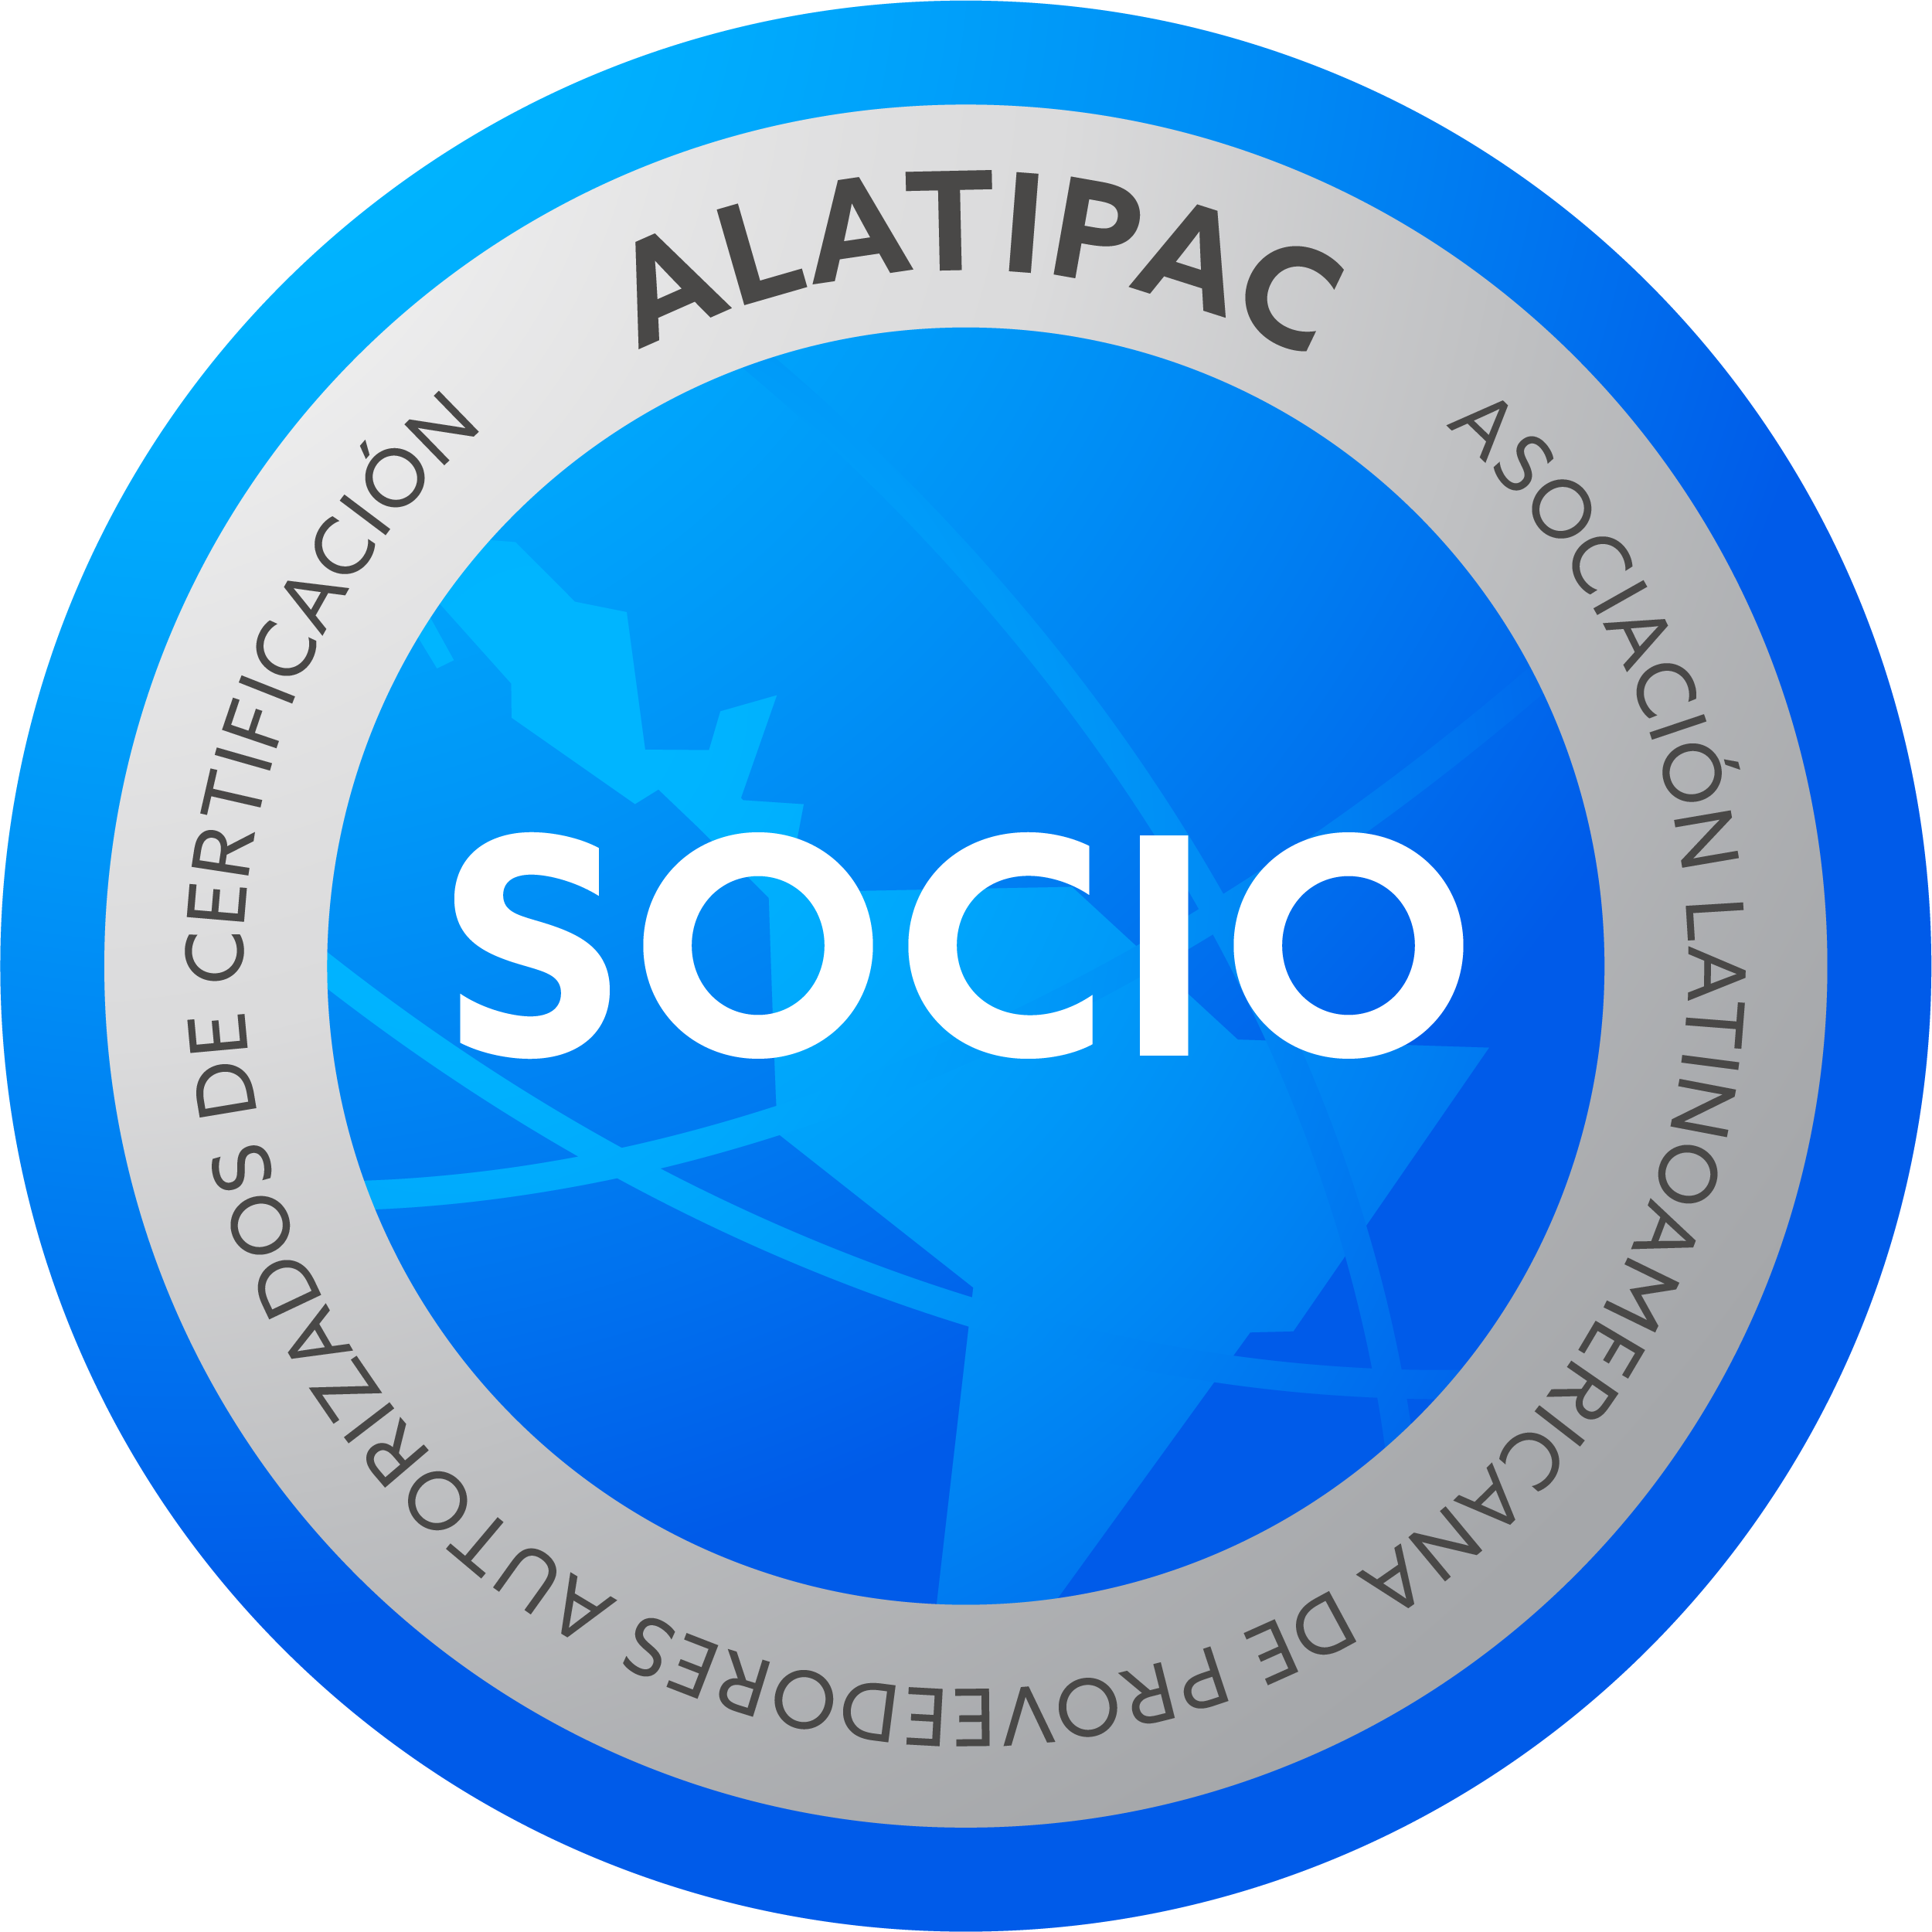 Logo Socio Alatipac